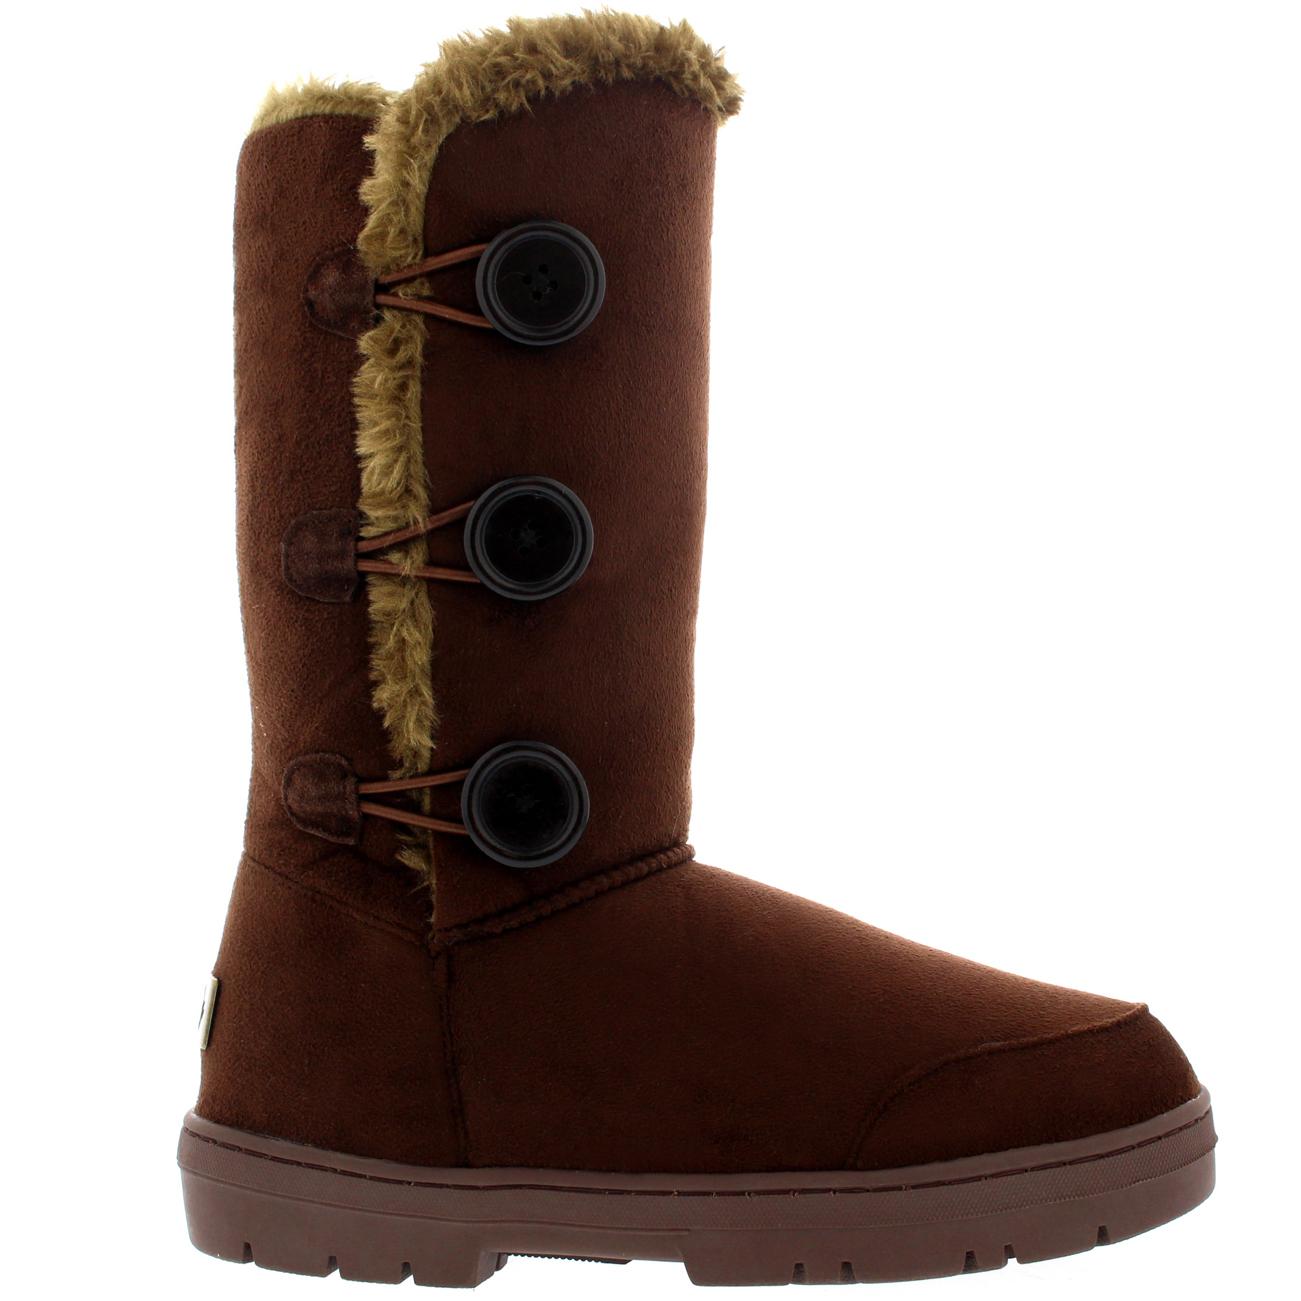 Amazing Skechers USA Women39s HighlandersTall Quilt Snow Boot